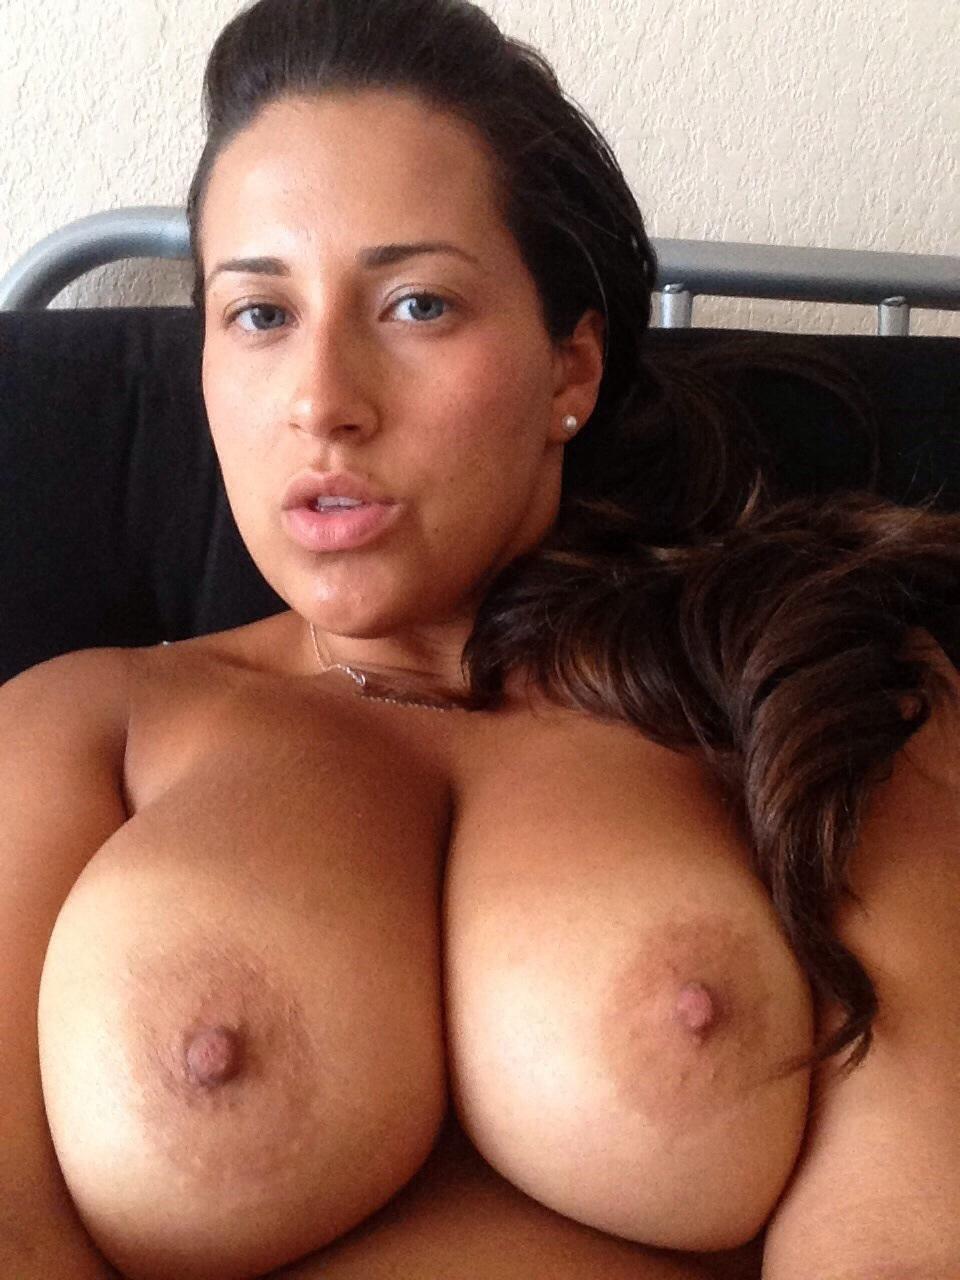 huge-boobs-tits-naked-mix-vol5-84